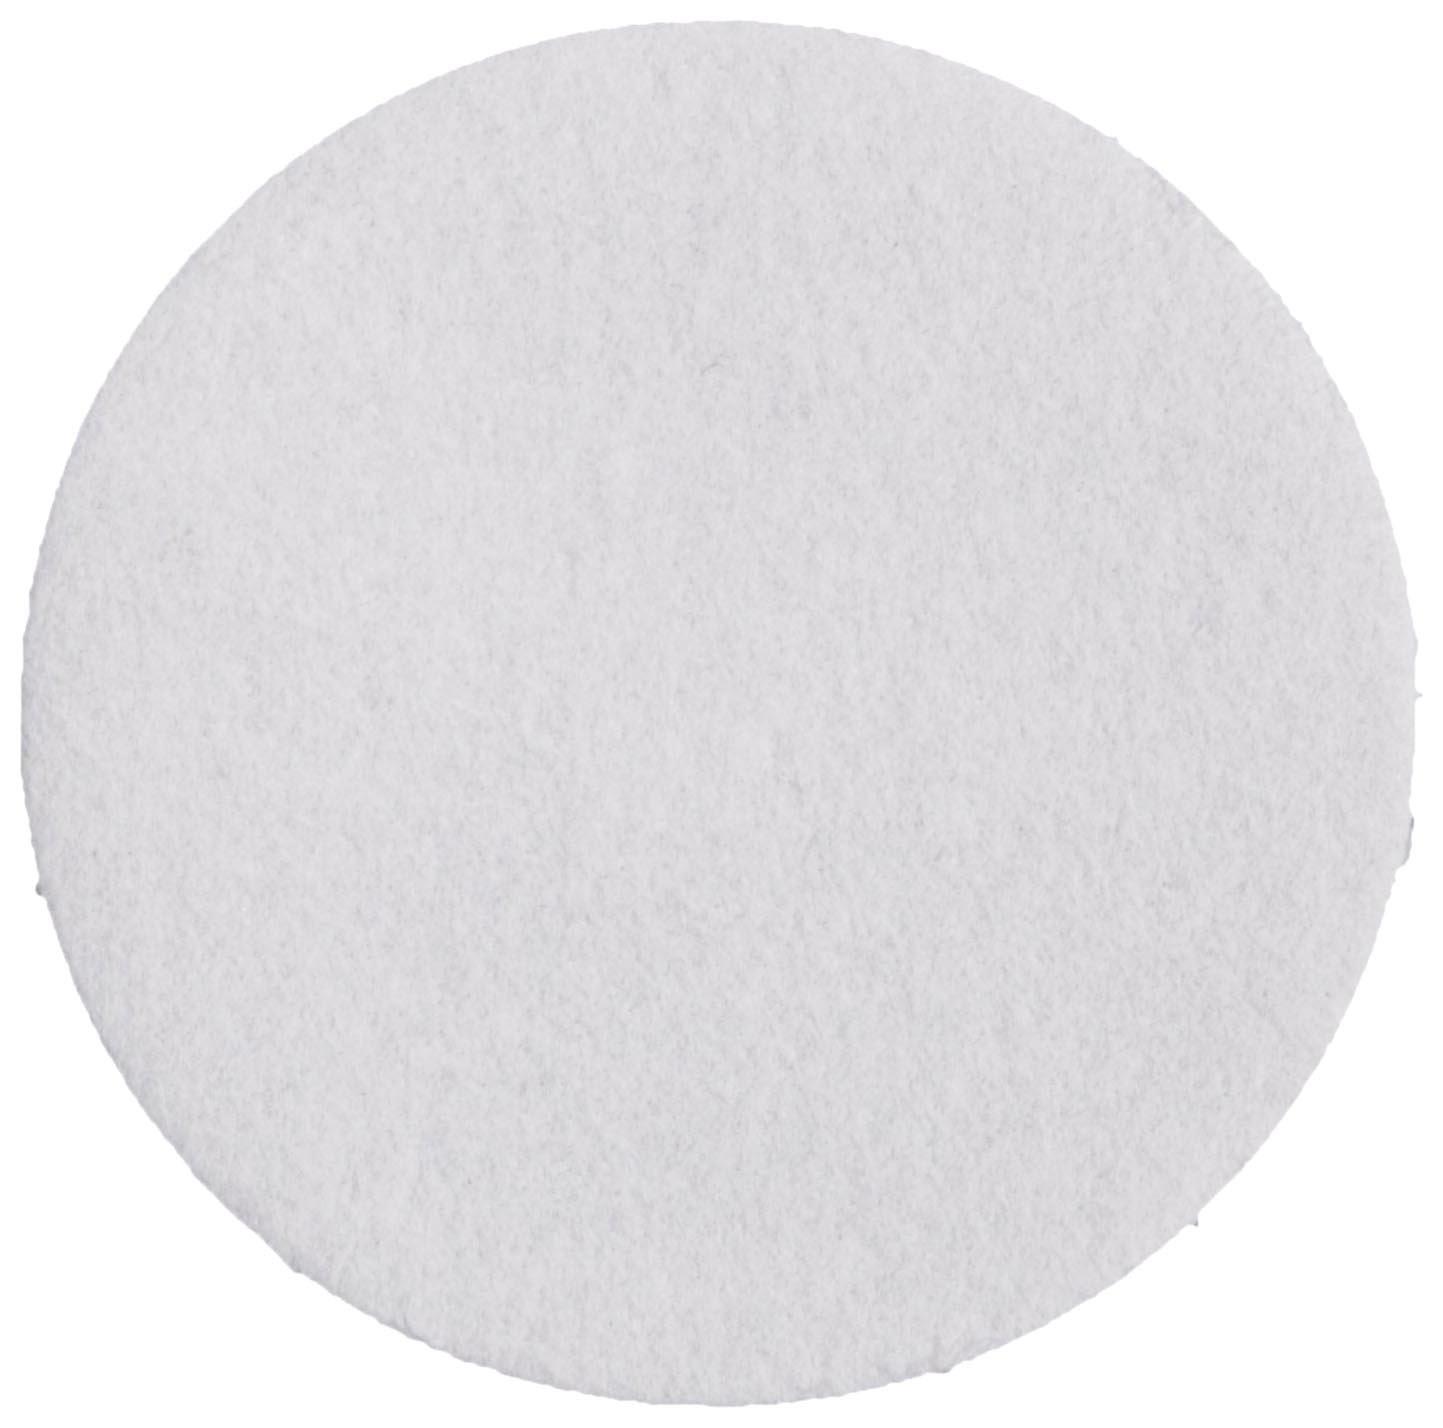 Whatman 10312209 Quantitative Filter Paper, 8-10 Micron, Grade 598, 90mm Diameter (Pack of 100)